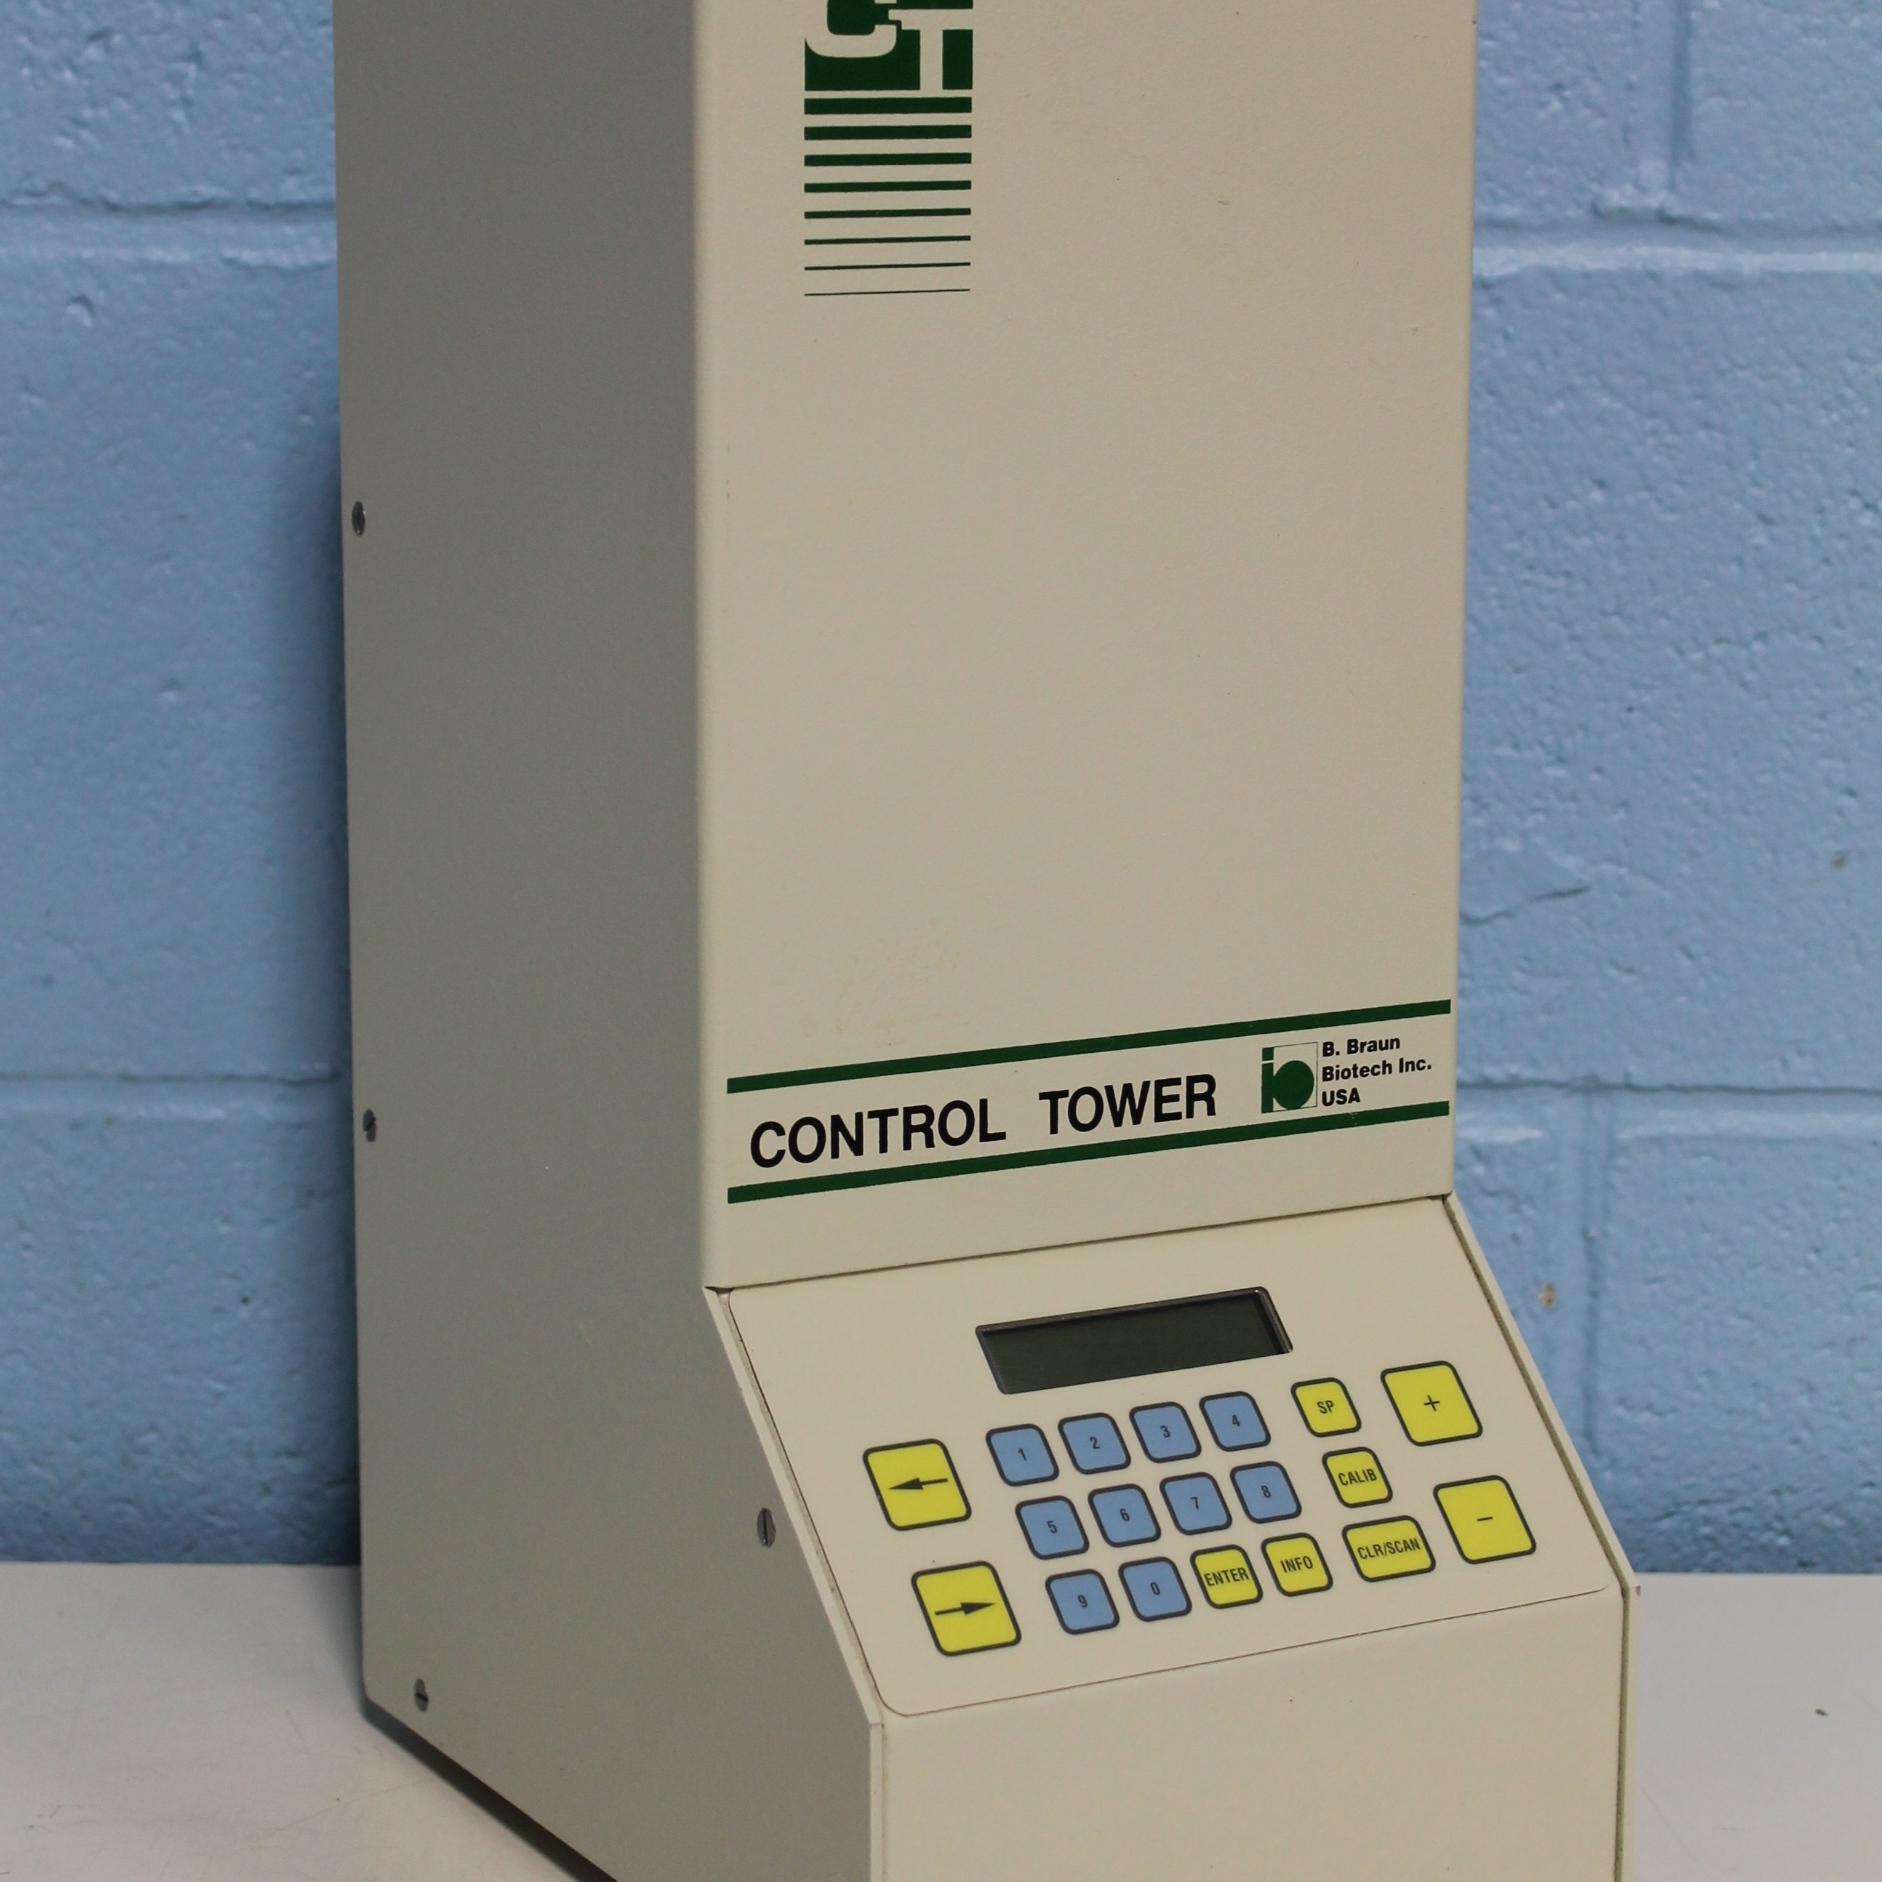 B. Braun Biotech CT Control Tower Image